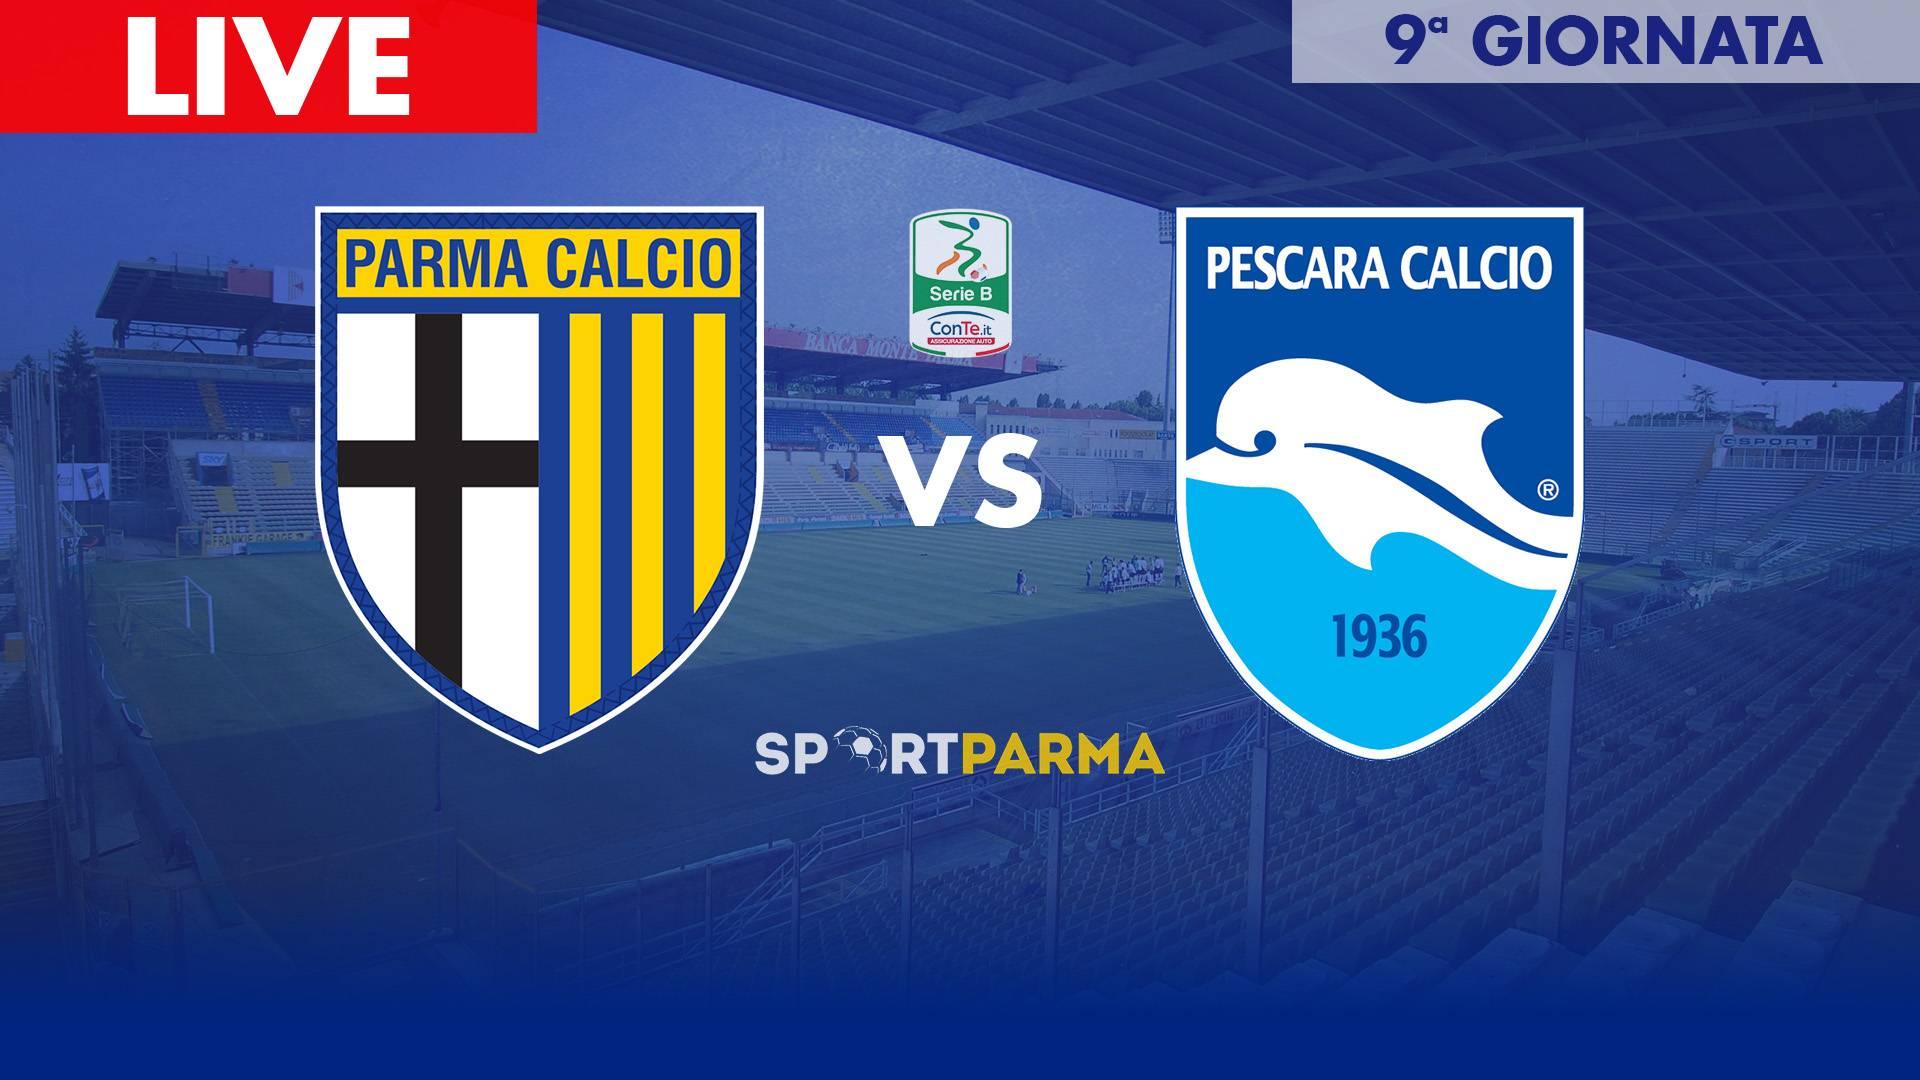 Colpaccio del Pescara a Parma: Brugman rilancia la squadra di Zeman